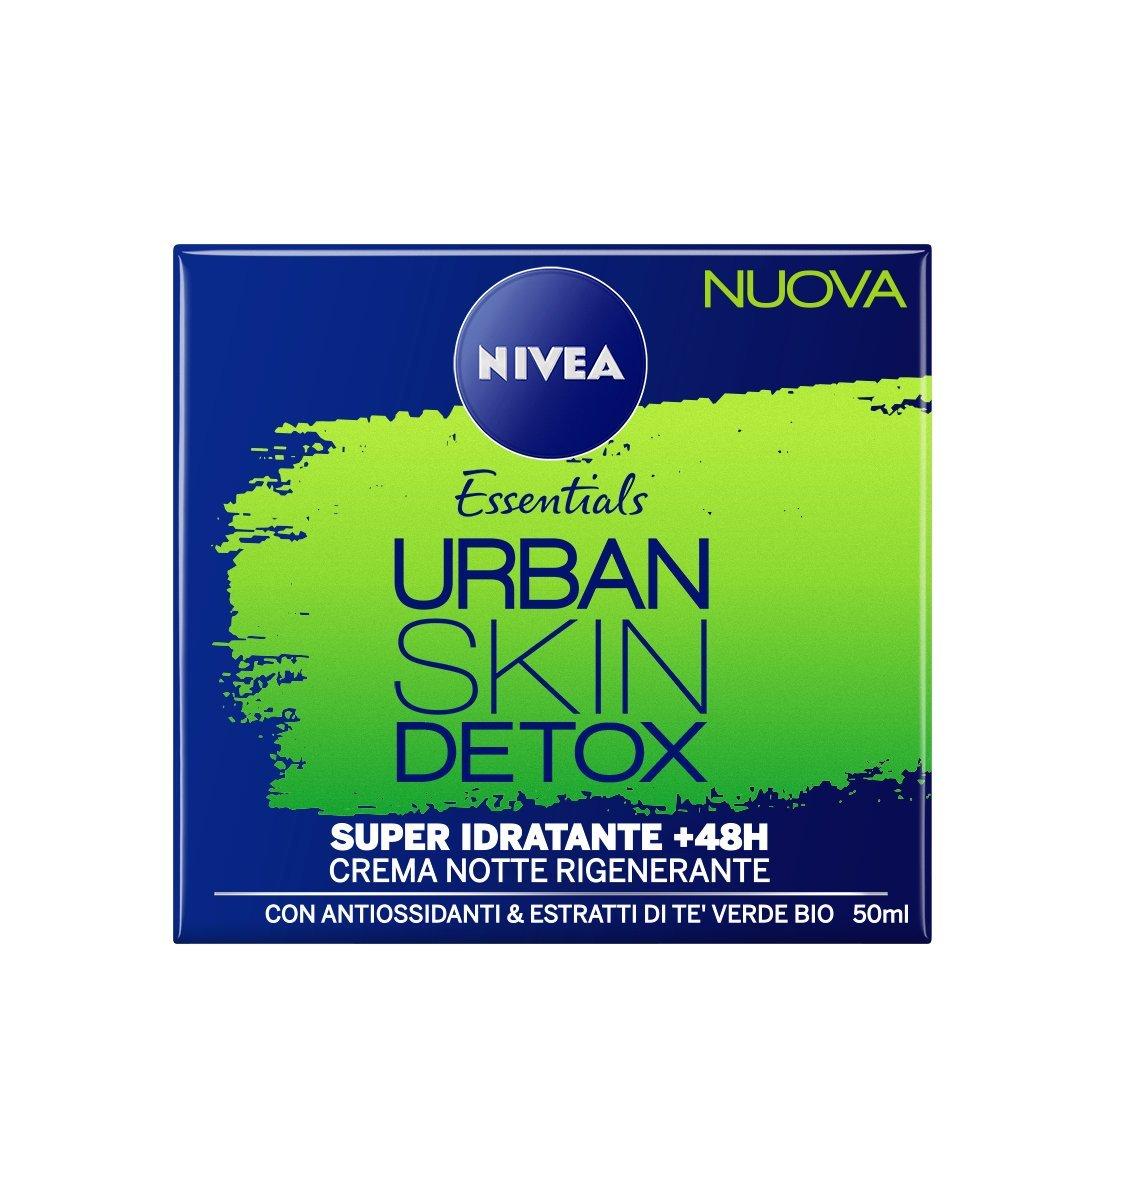 Nivea Essentials Urban Skin Detox Super Idratante +48H Crema Notte Rigenerante 50 ml